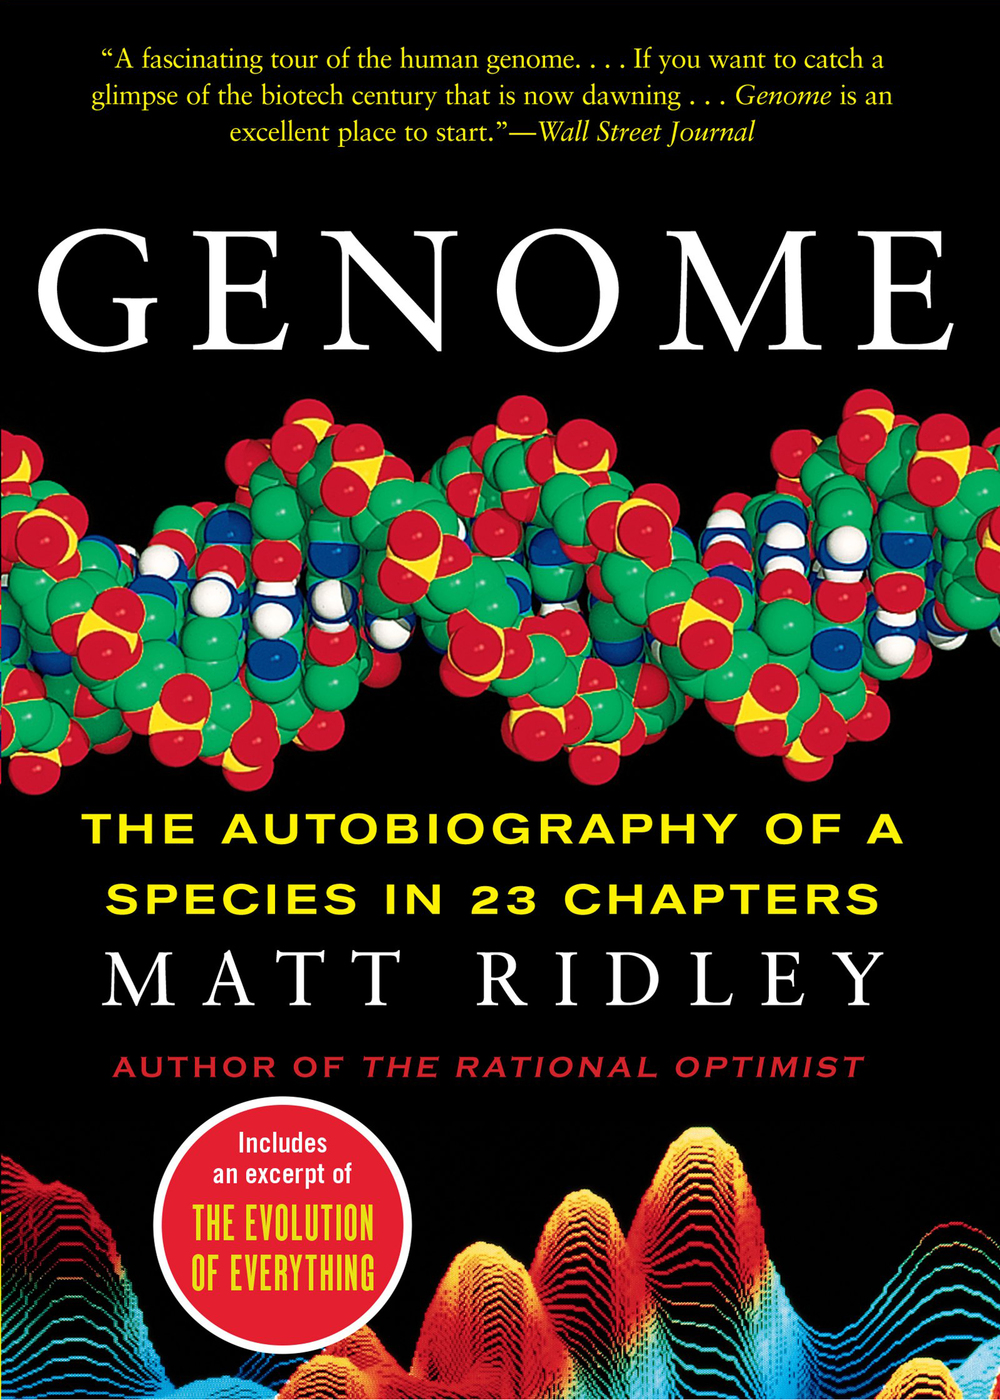 Ridley, Matt - Genome.jpg